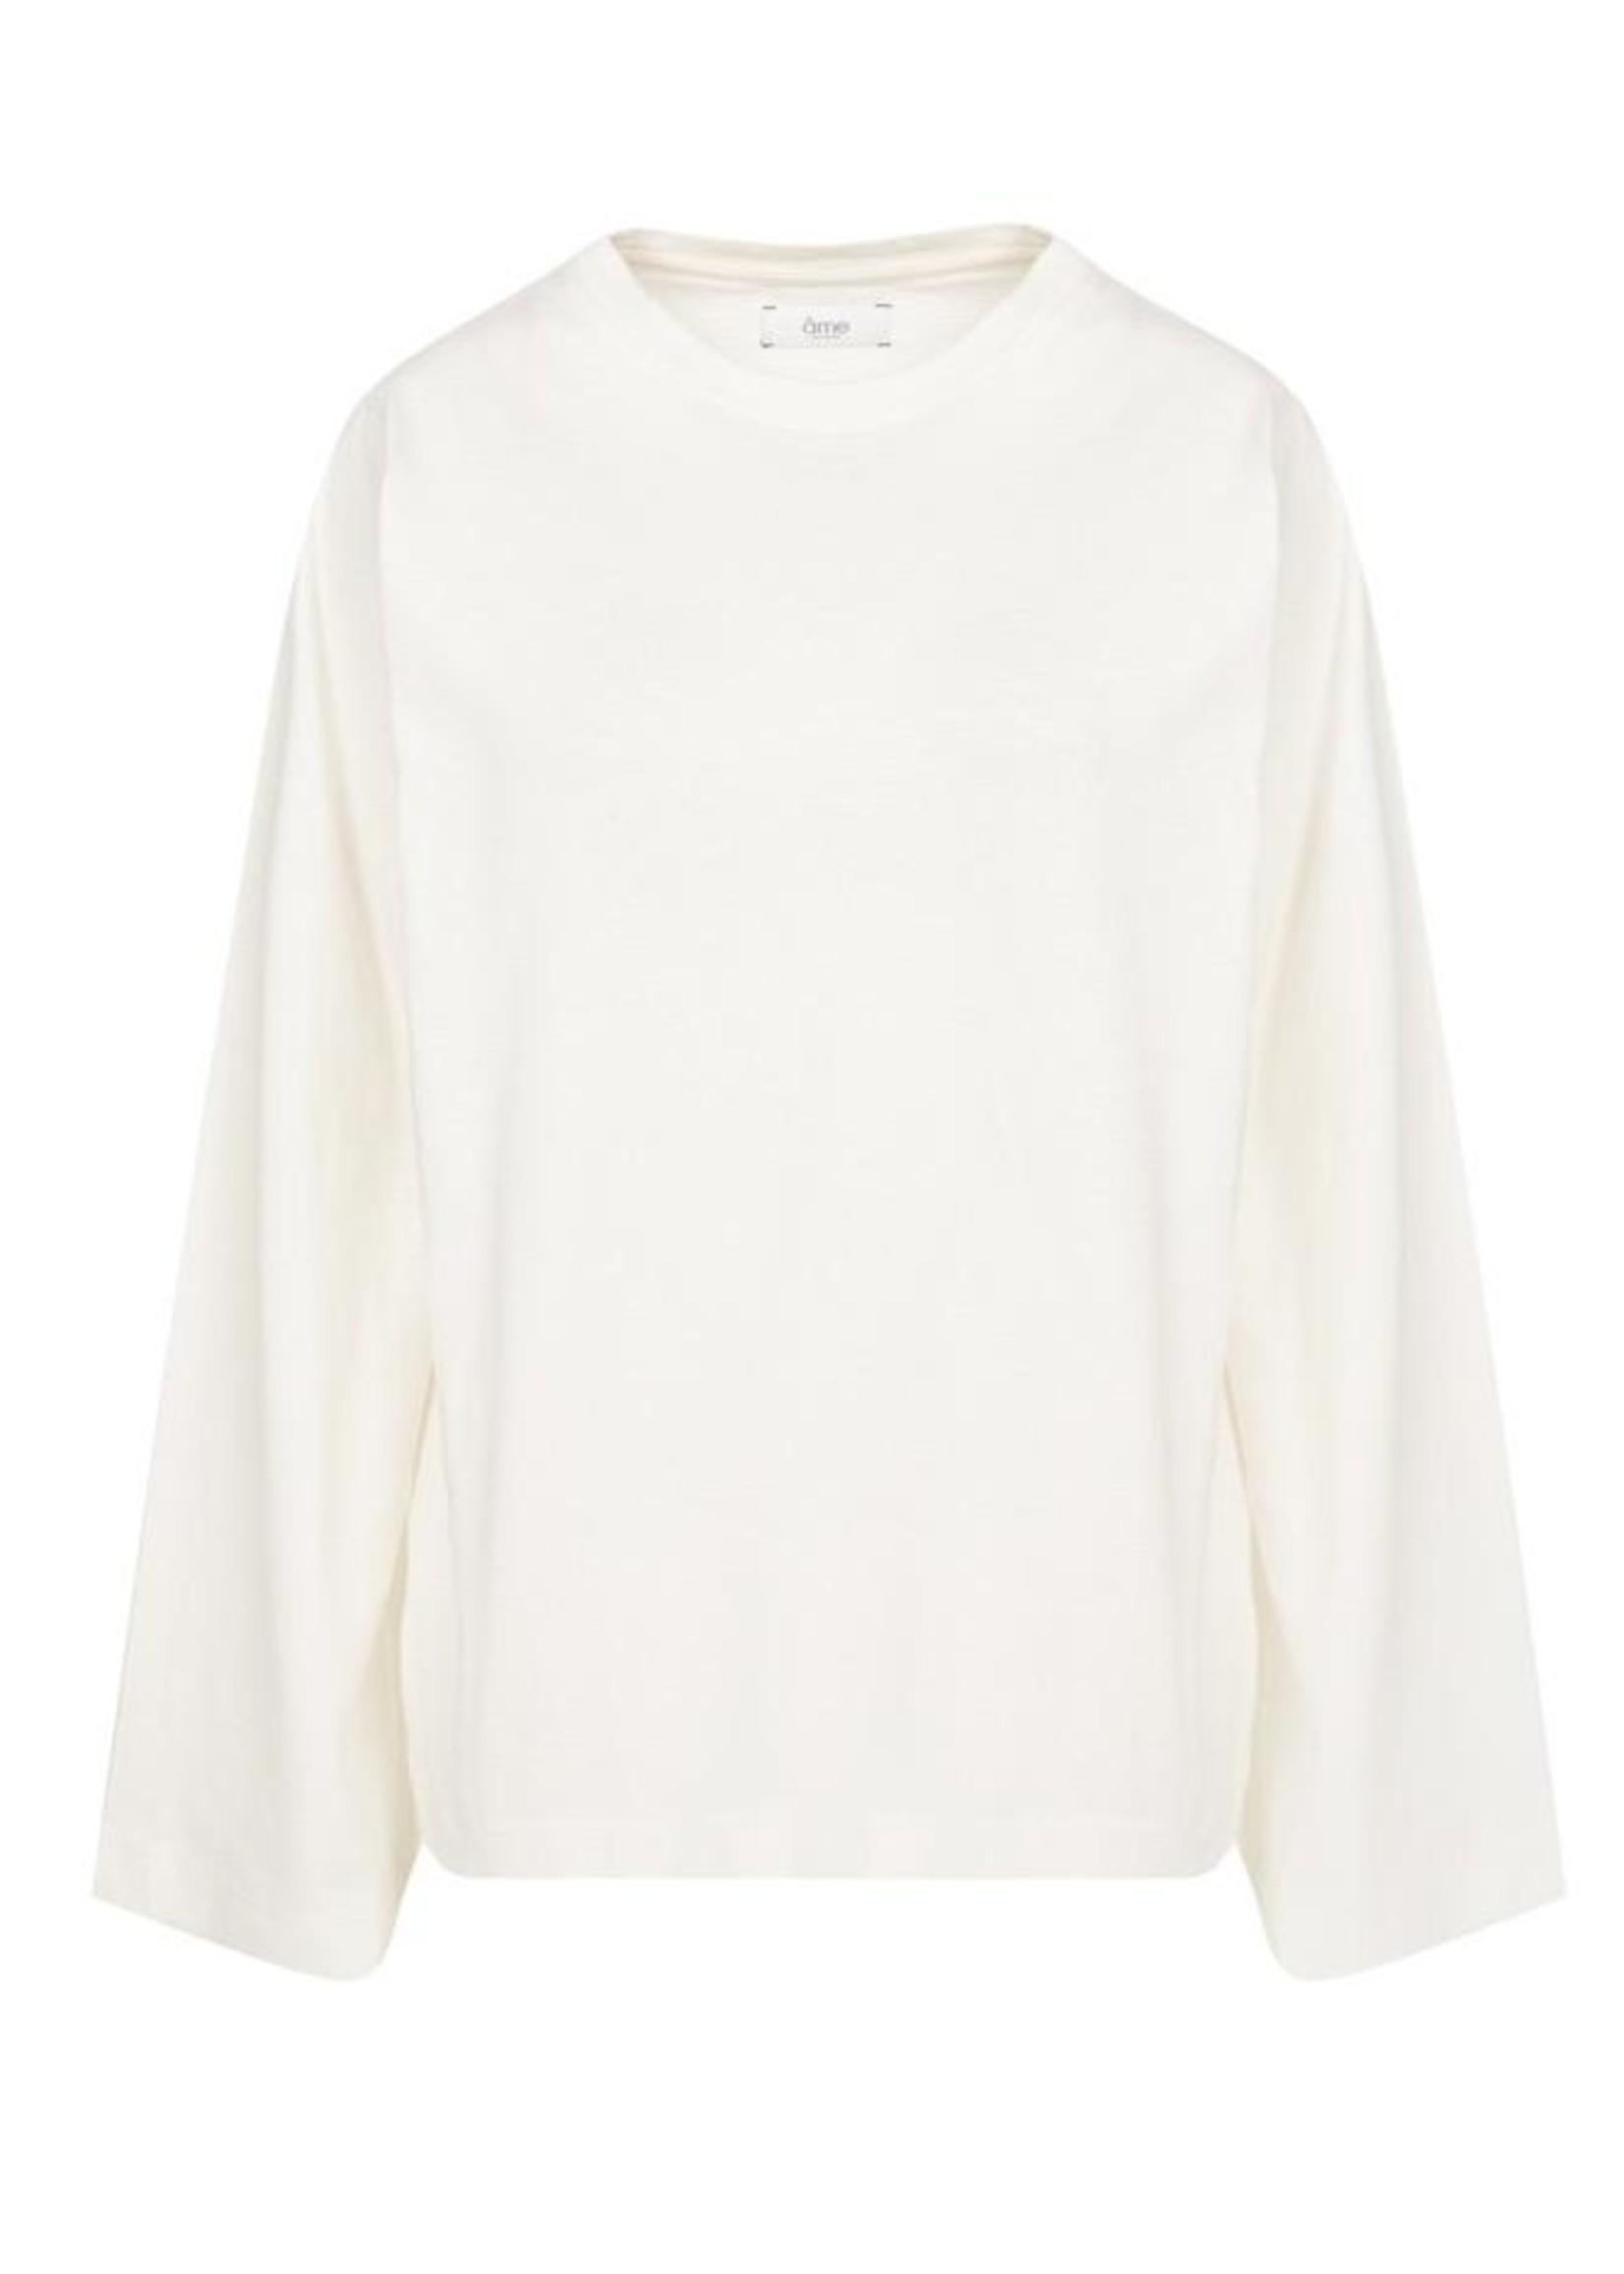 Ame ame antwerp enora shirt wide longsleeve , off white